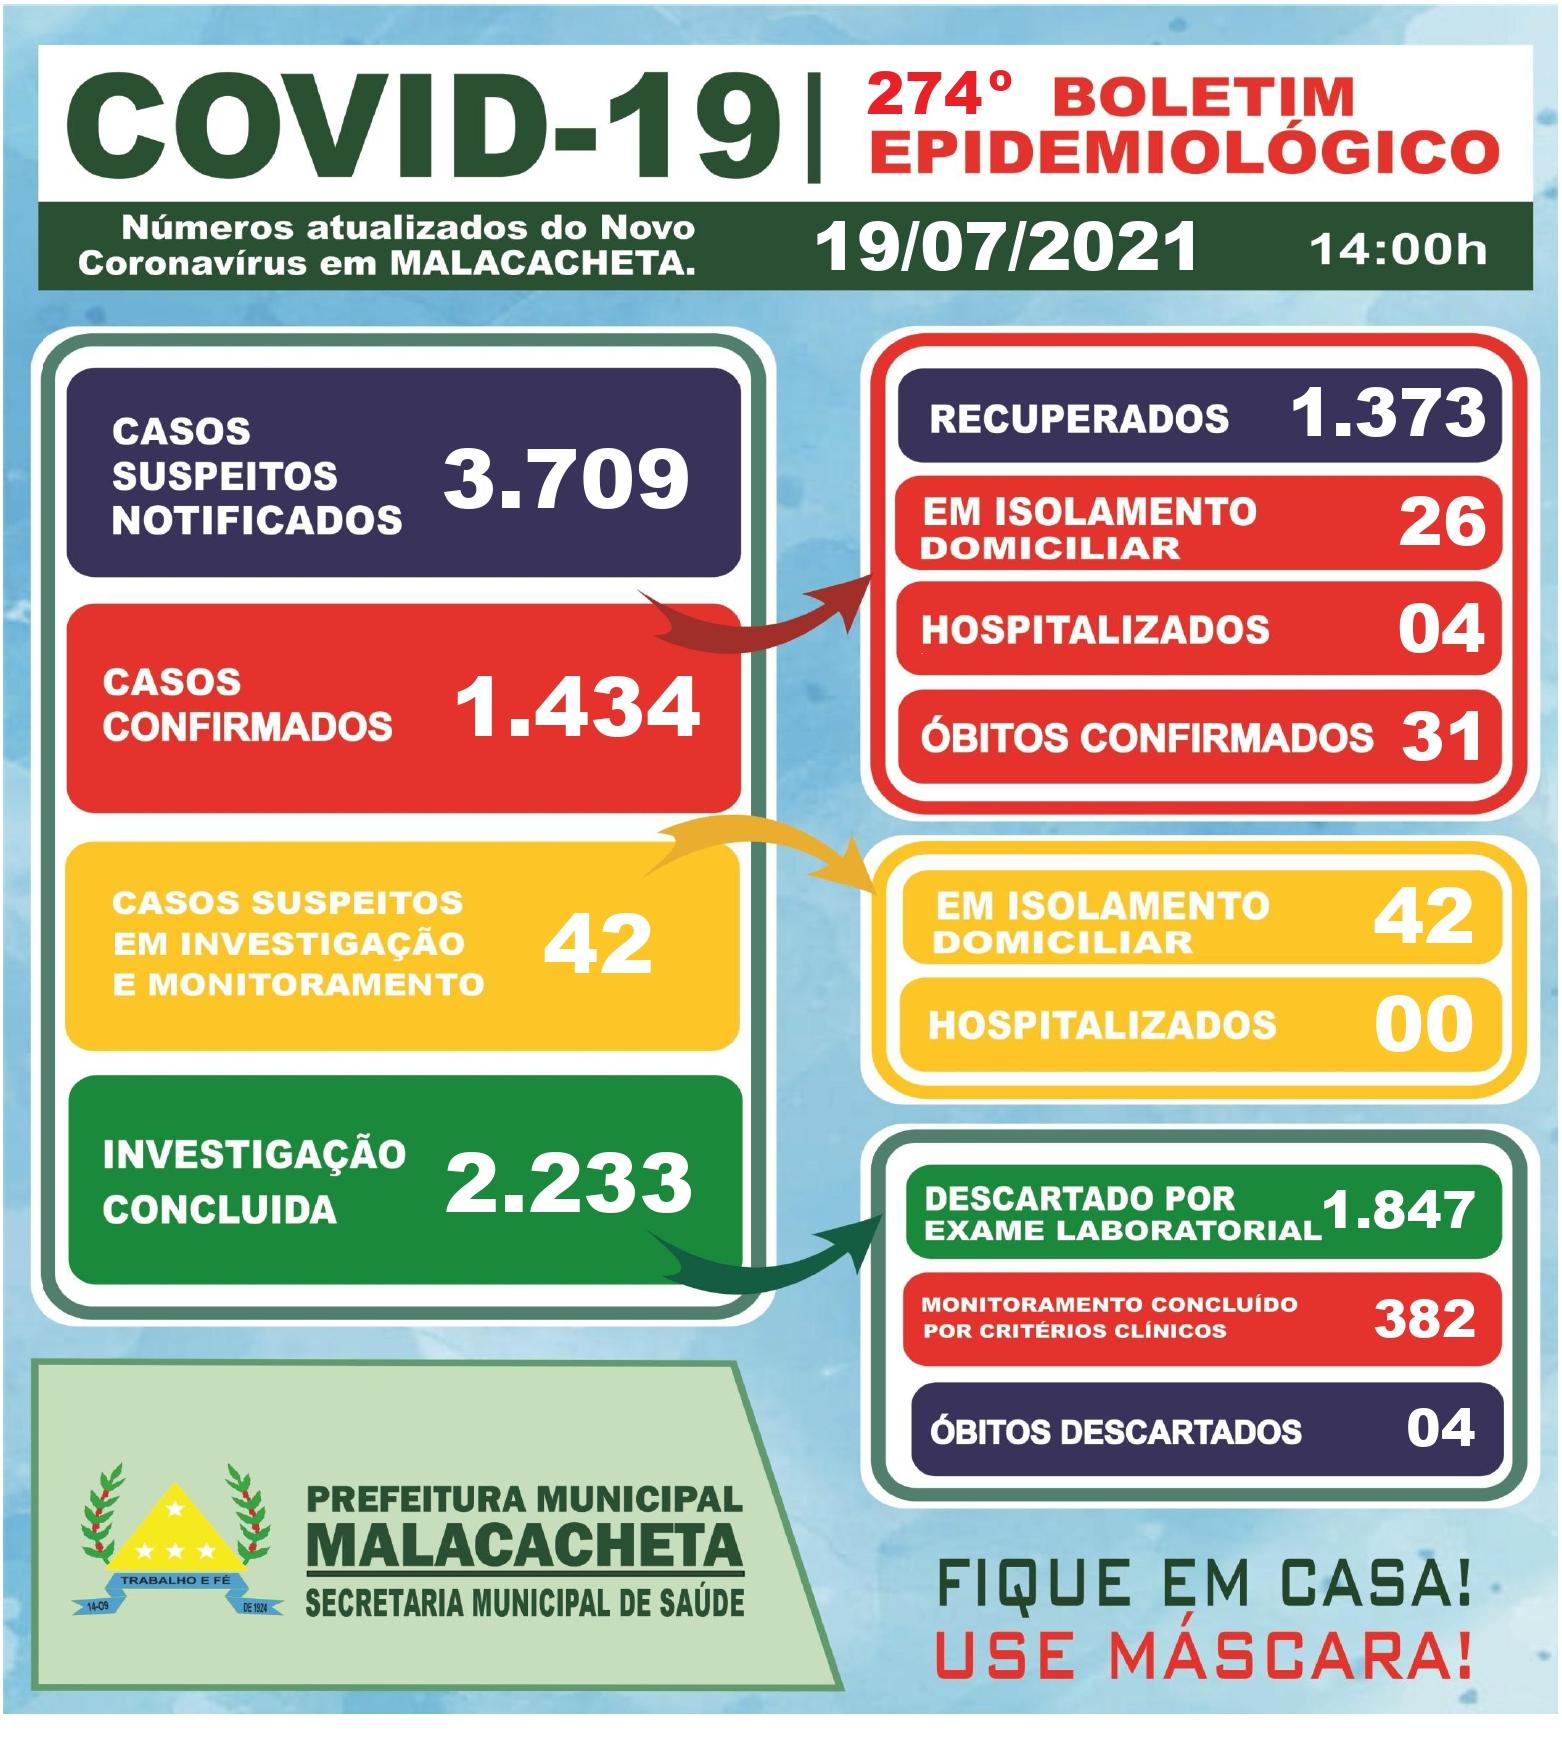 BOLETIM OFICIAL CORONAVÍRUS 19 DE JULHO DE 2021